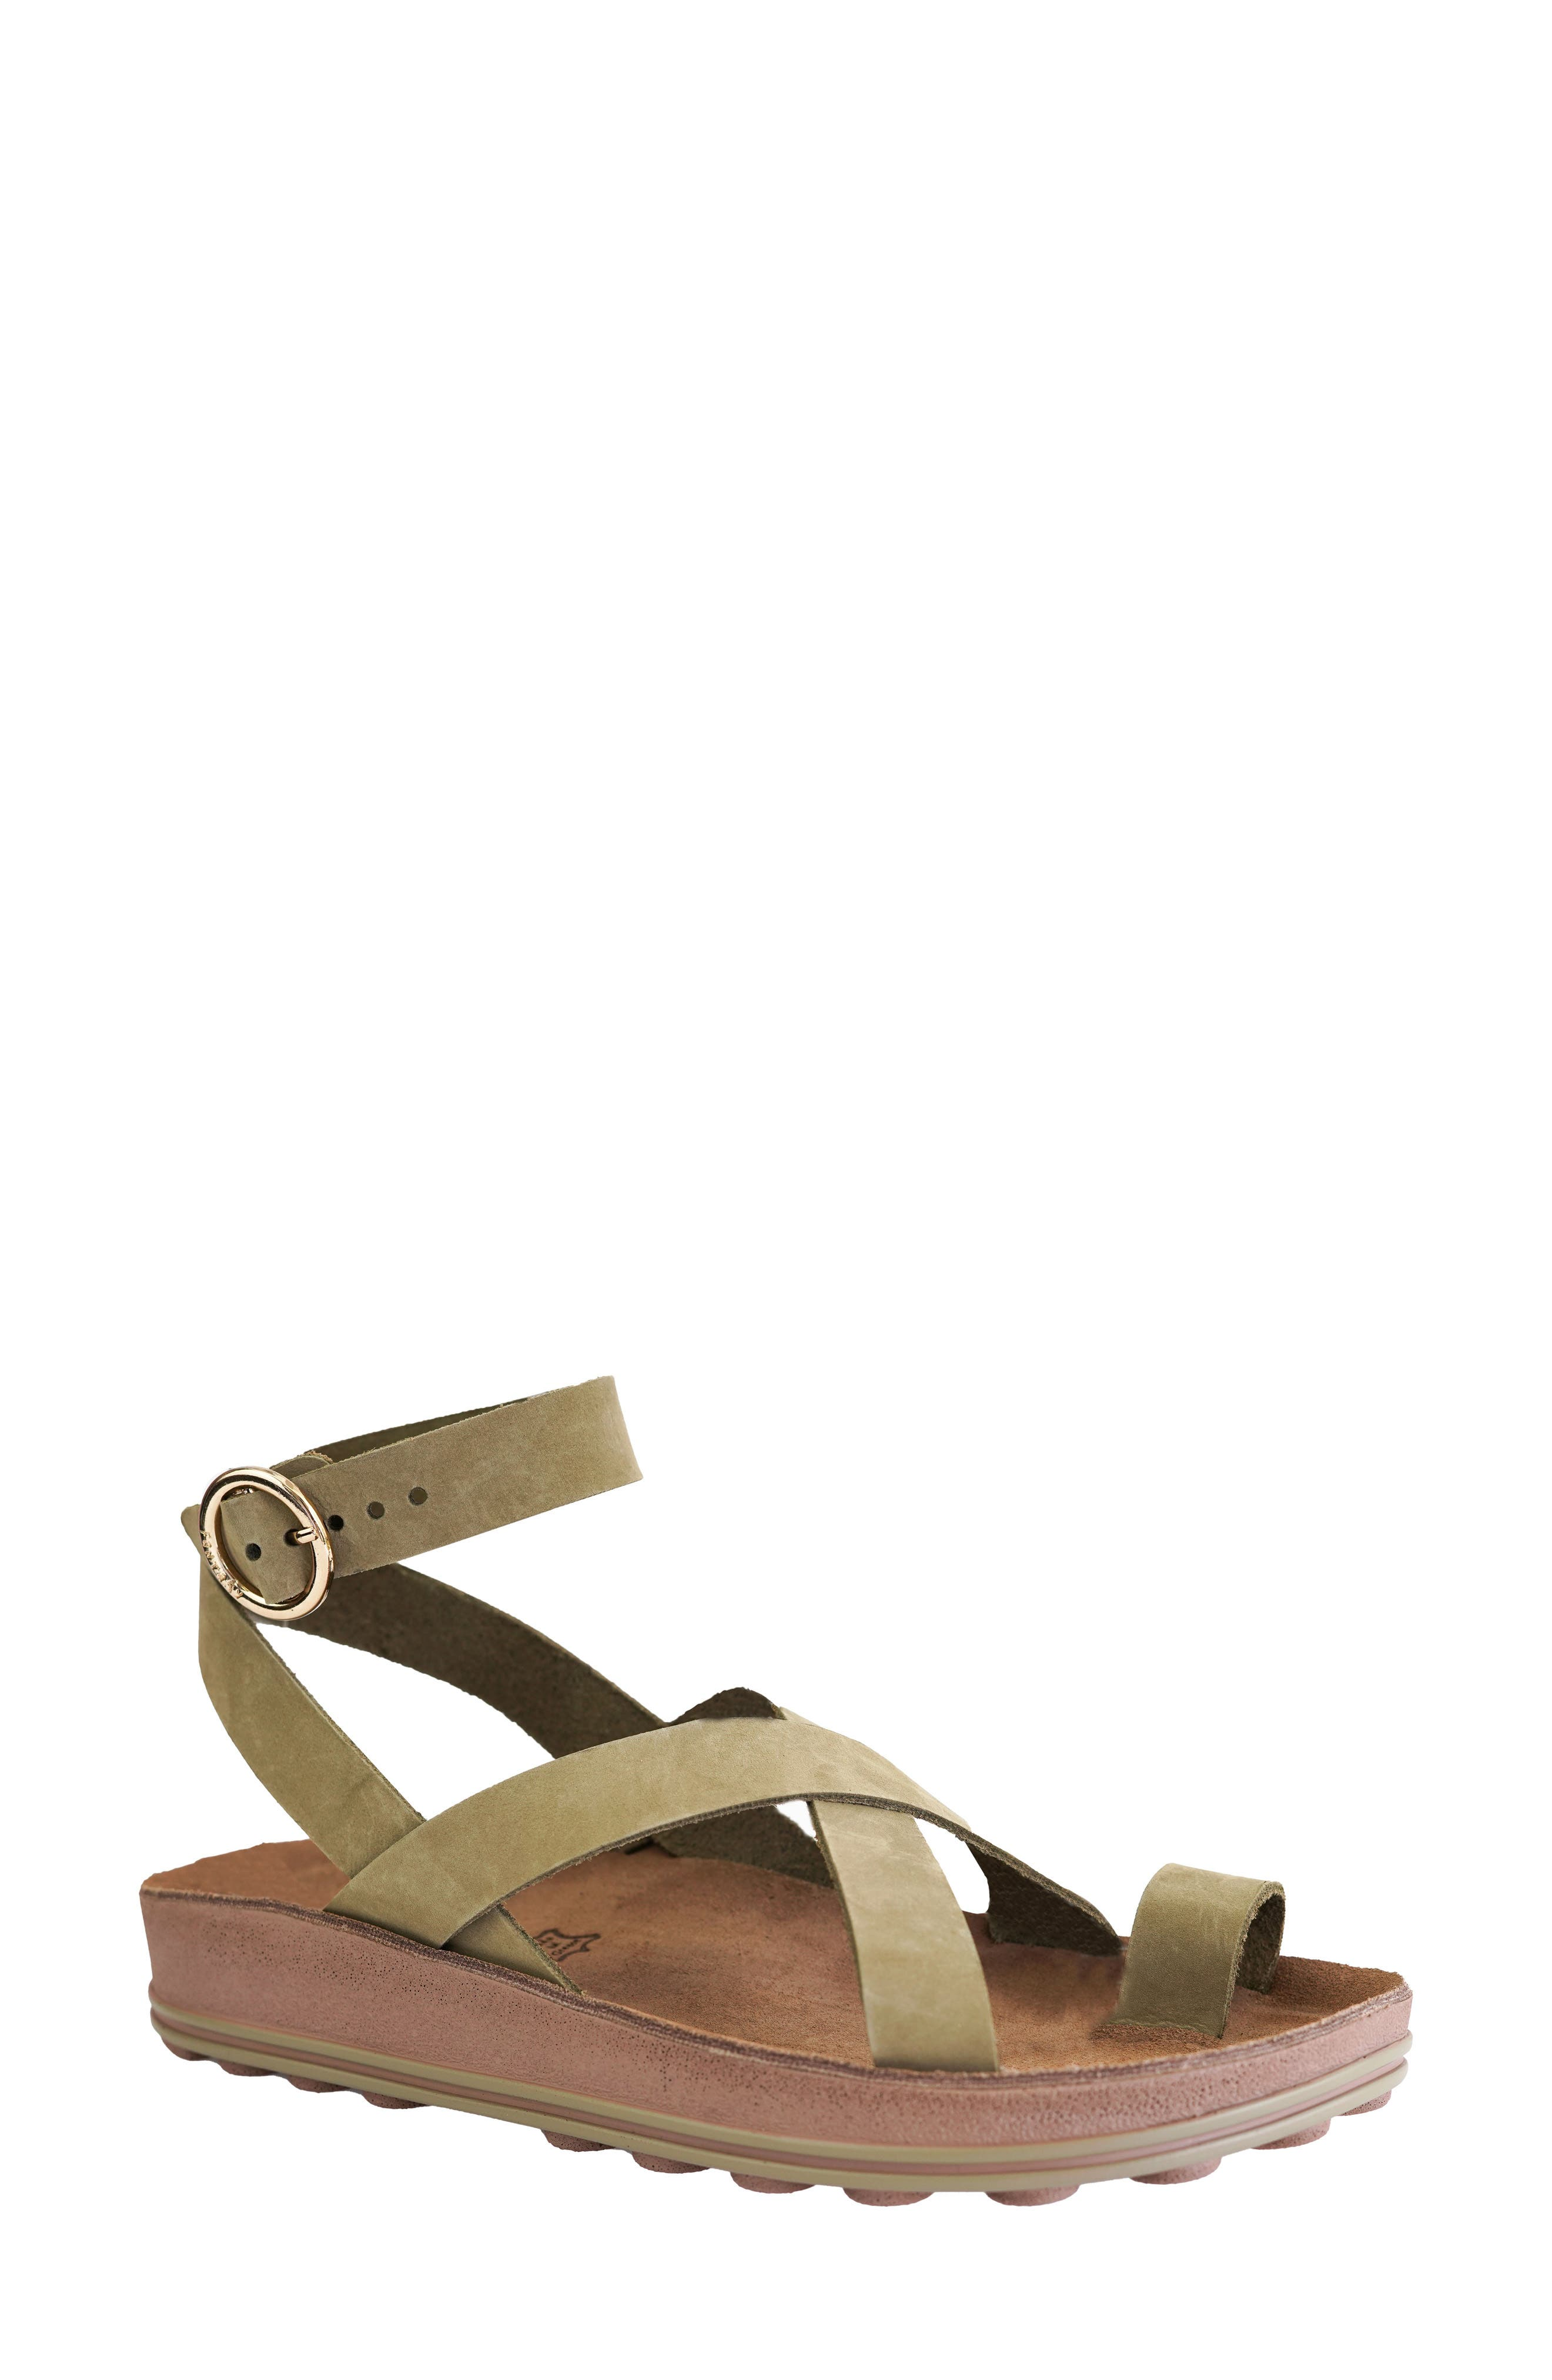 Norah Ankle Strap Sandal